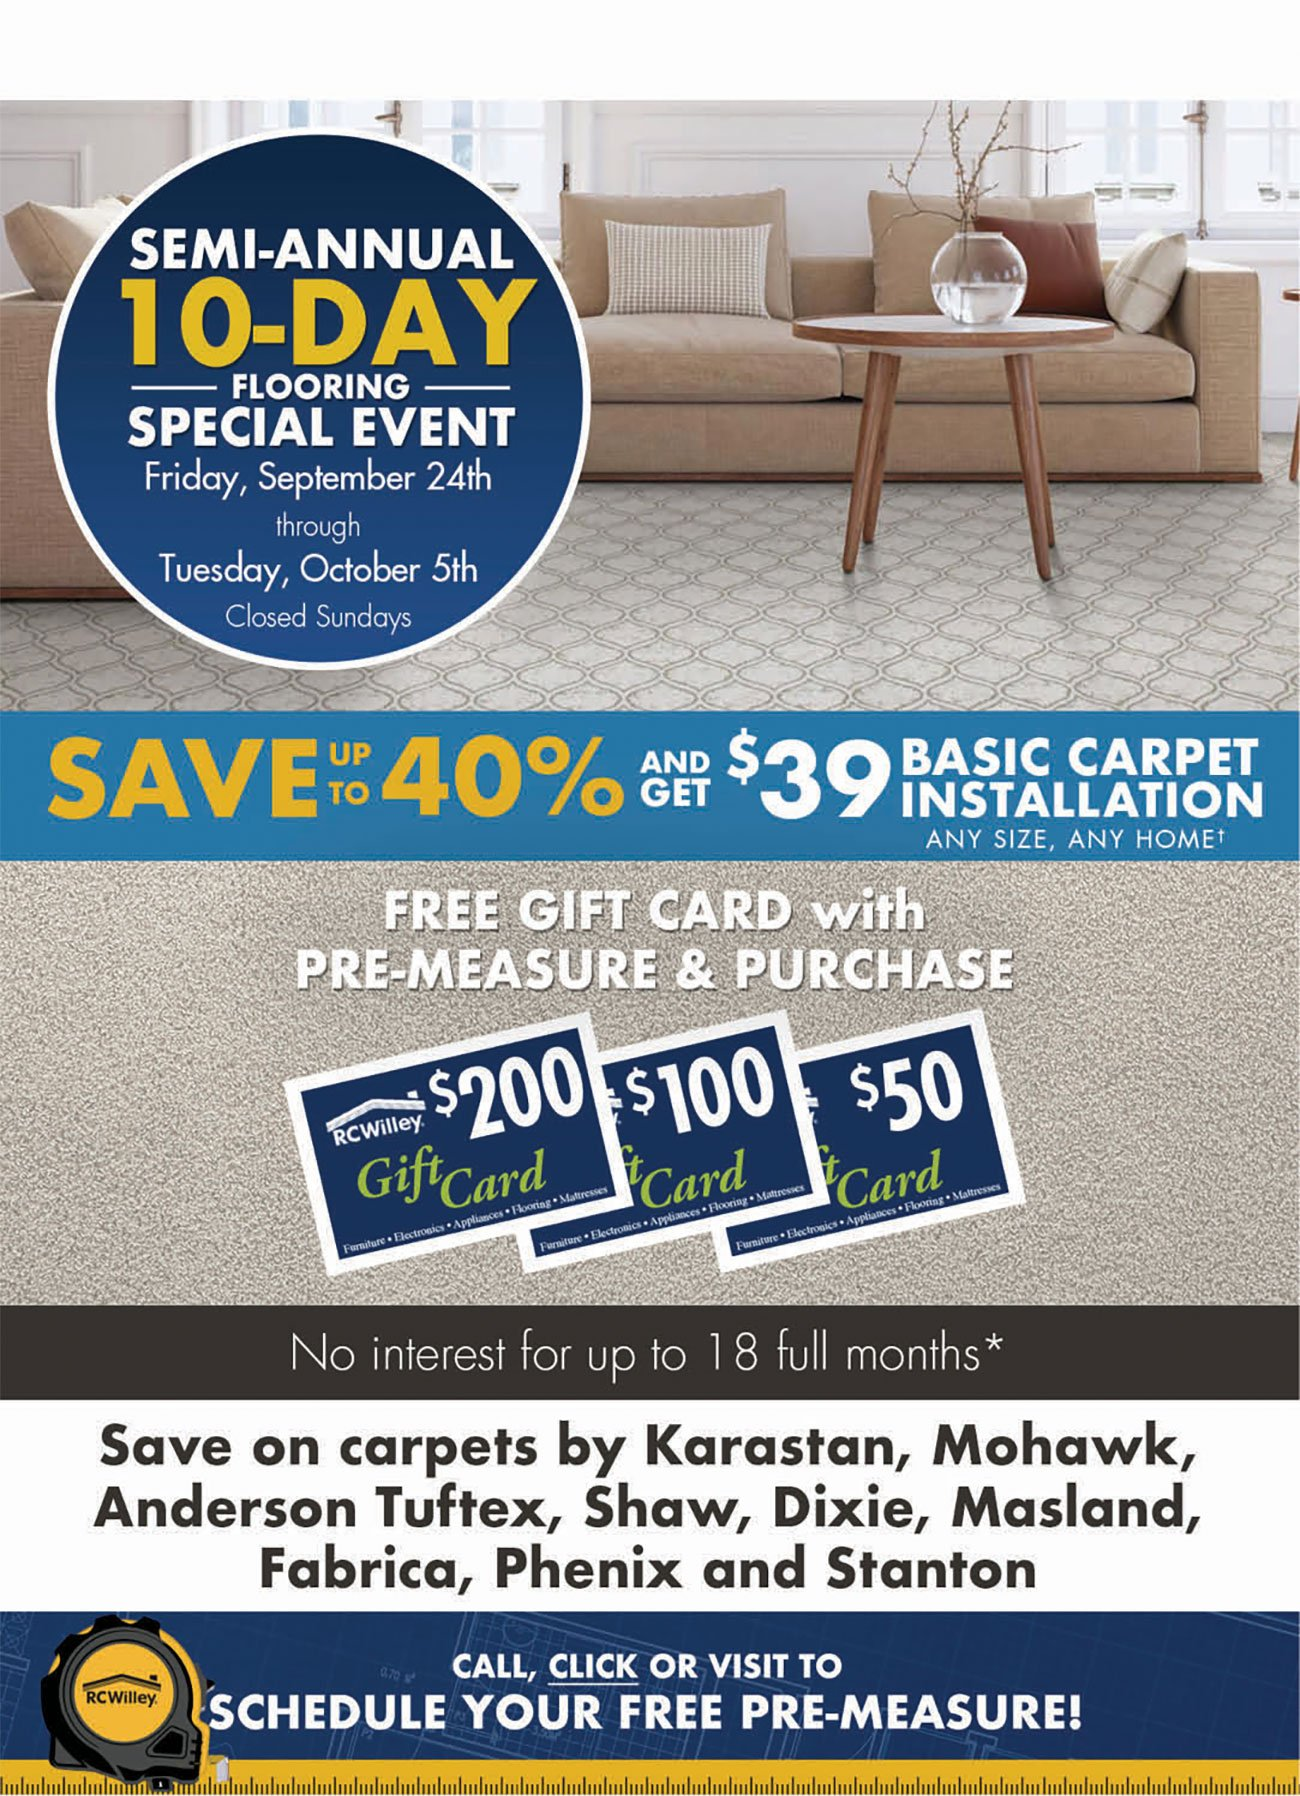 Semi-Annual-10-Day-Carpet-Event-Stripe